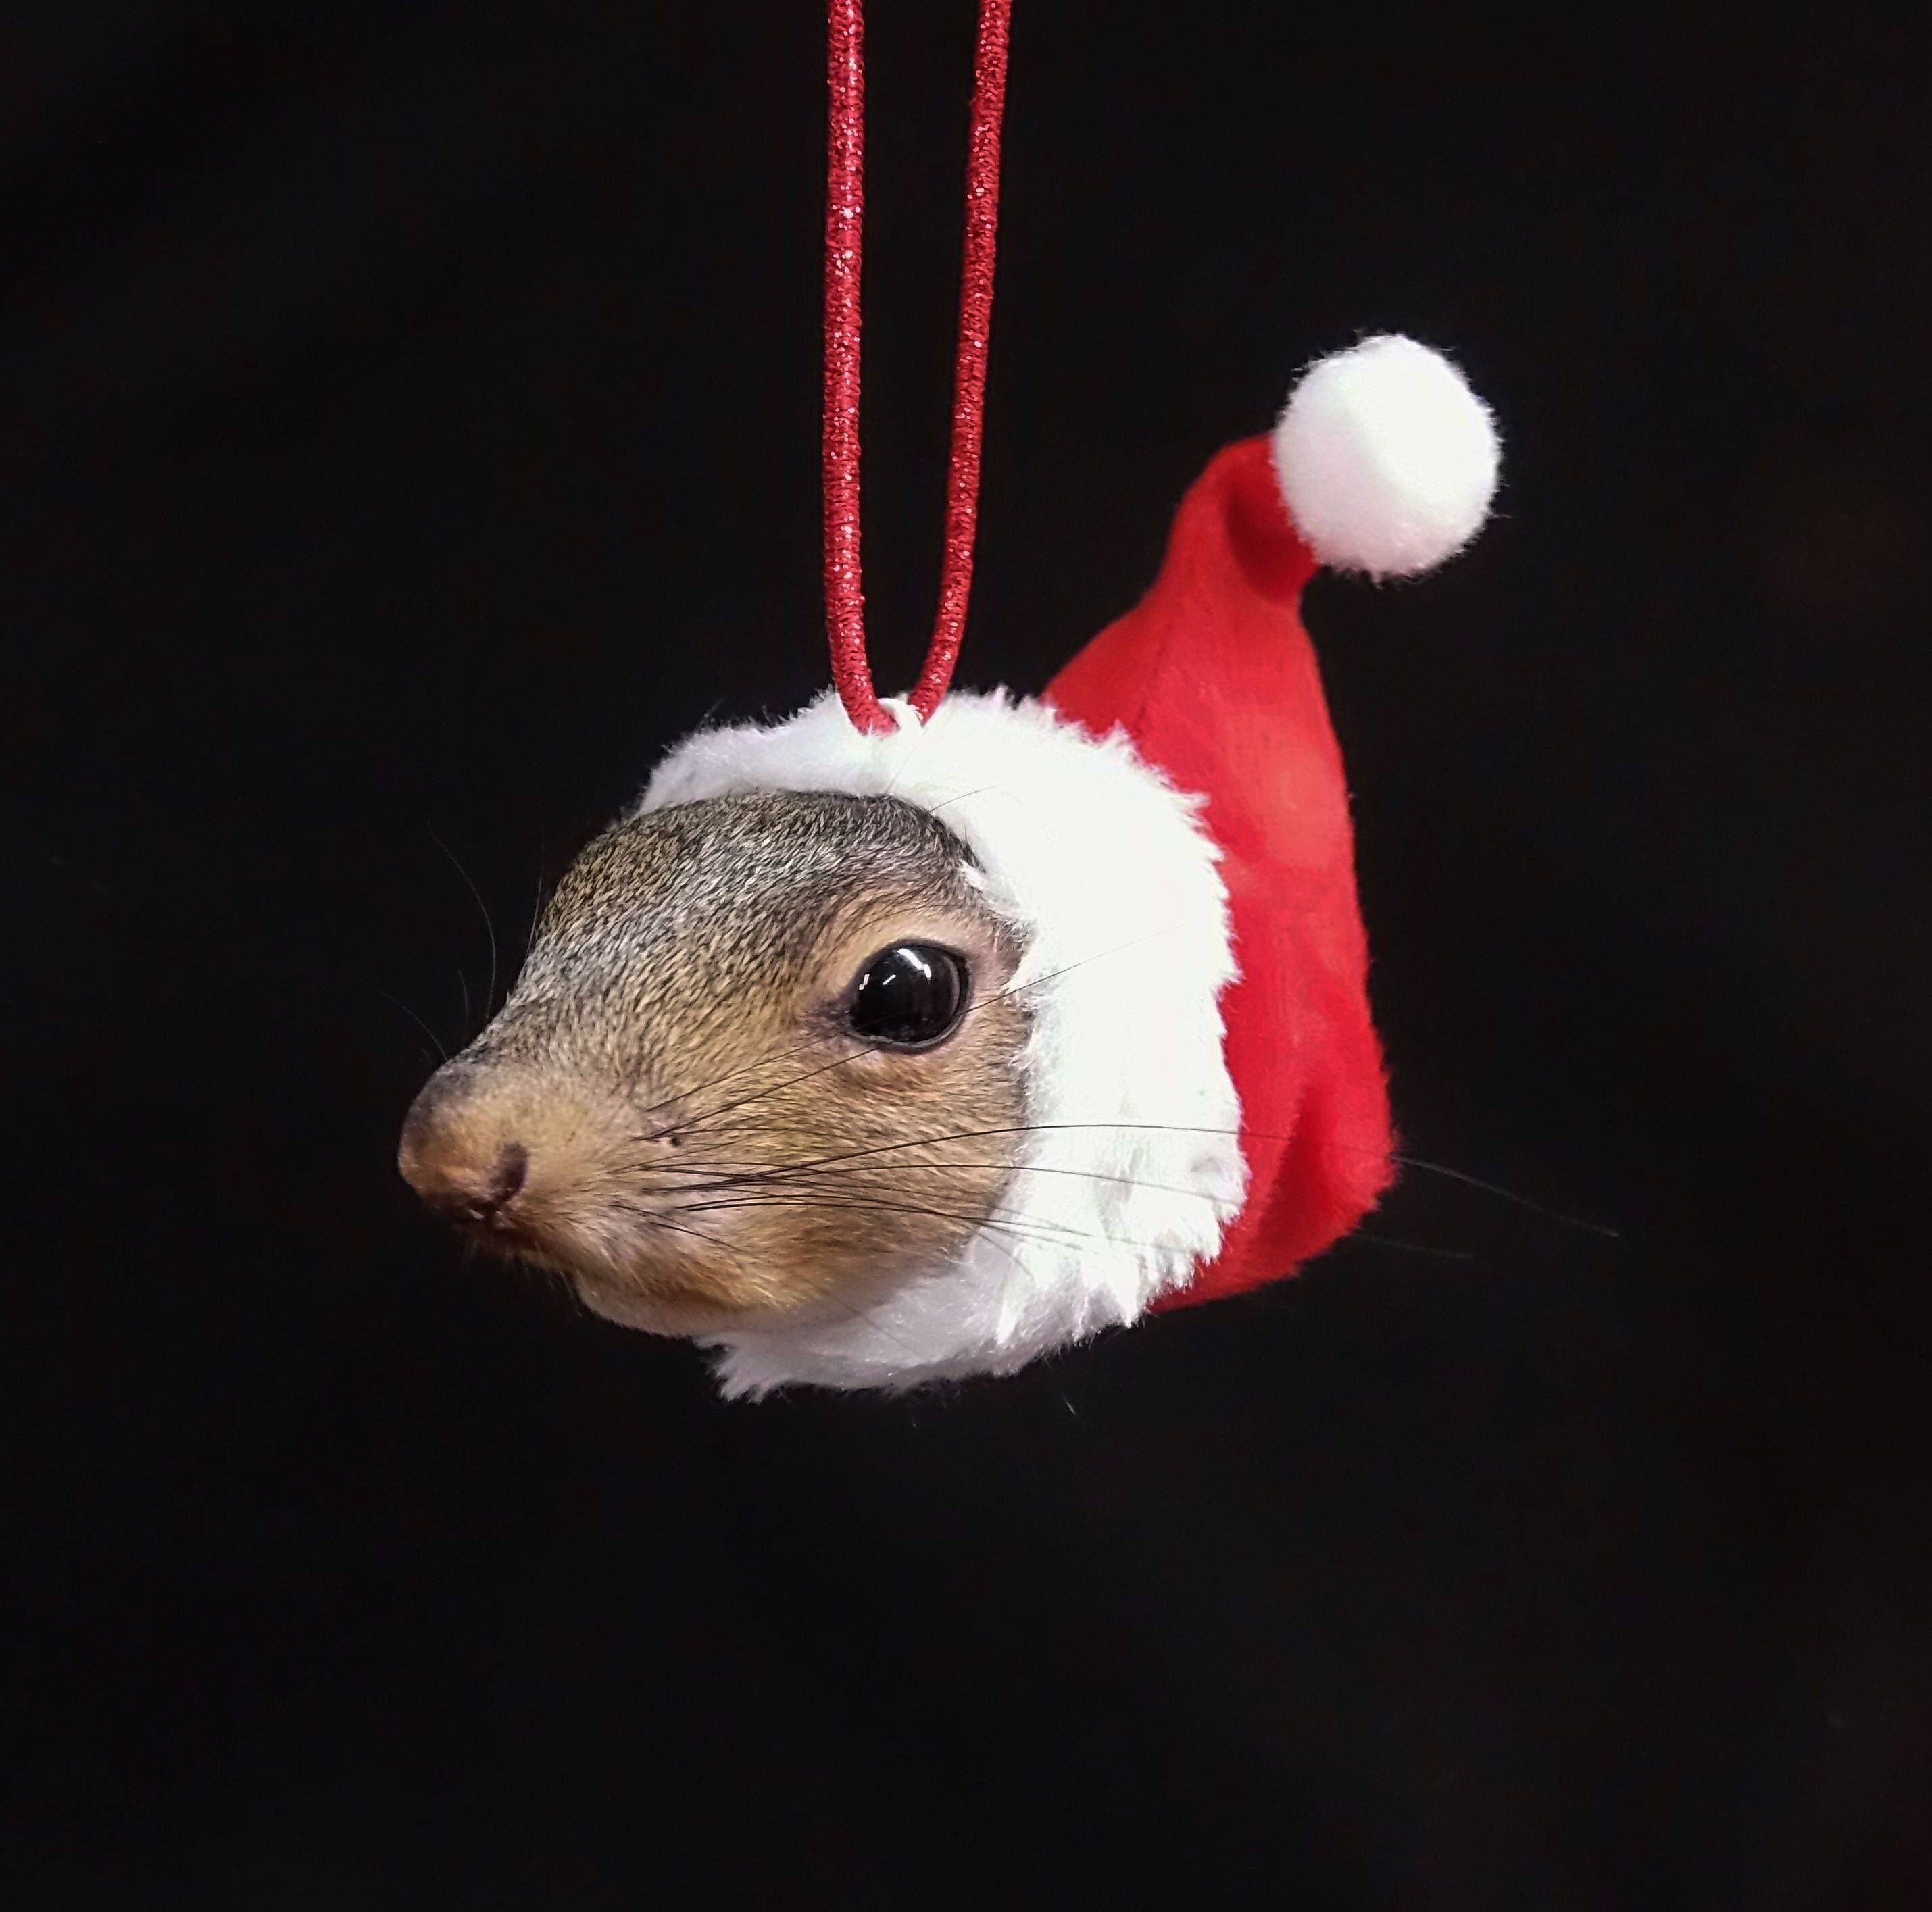 Squirrel Santa Claus Christmas tree ornament